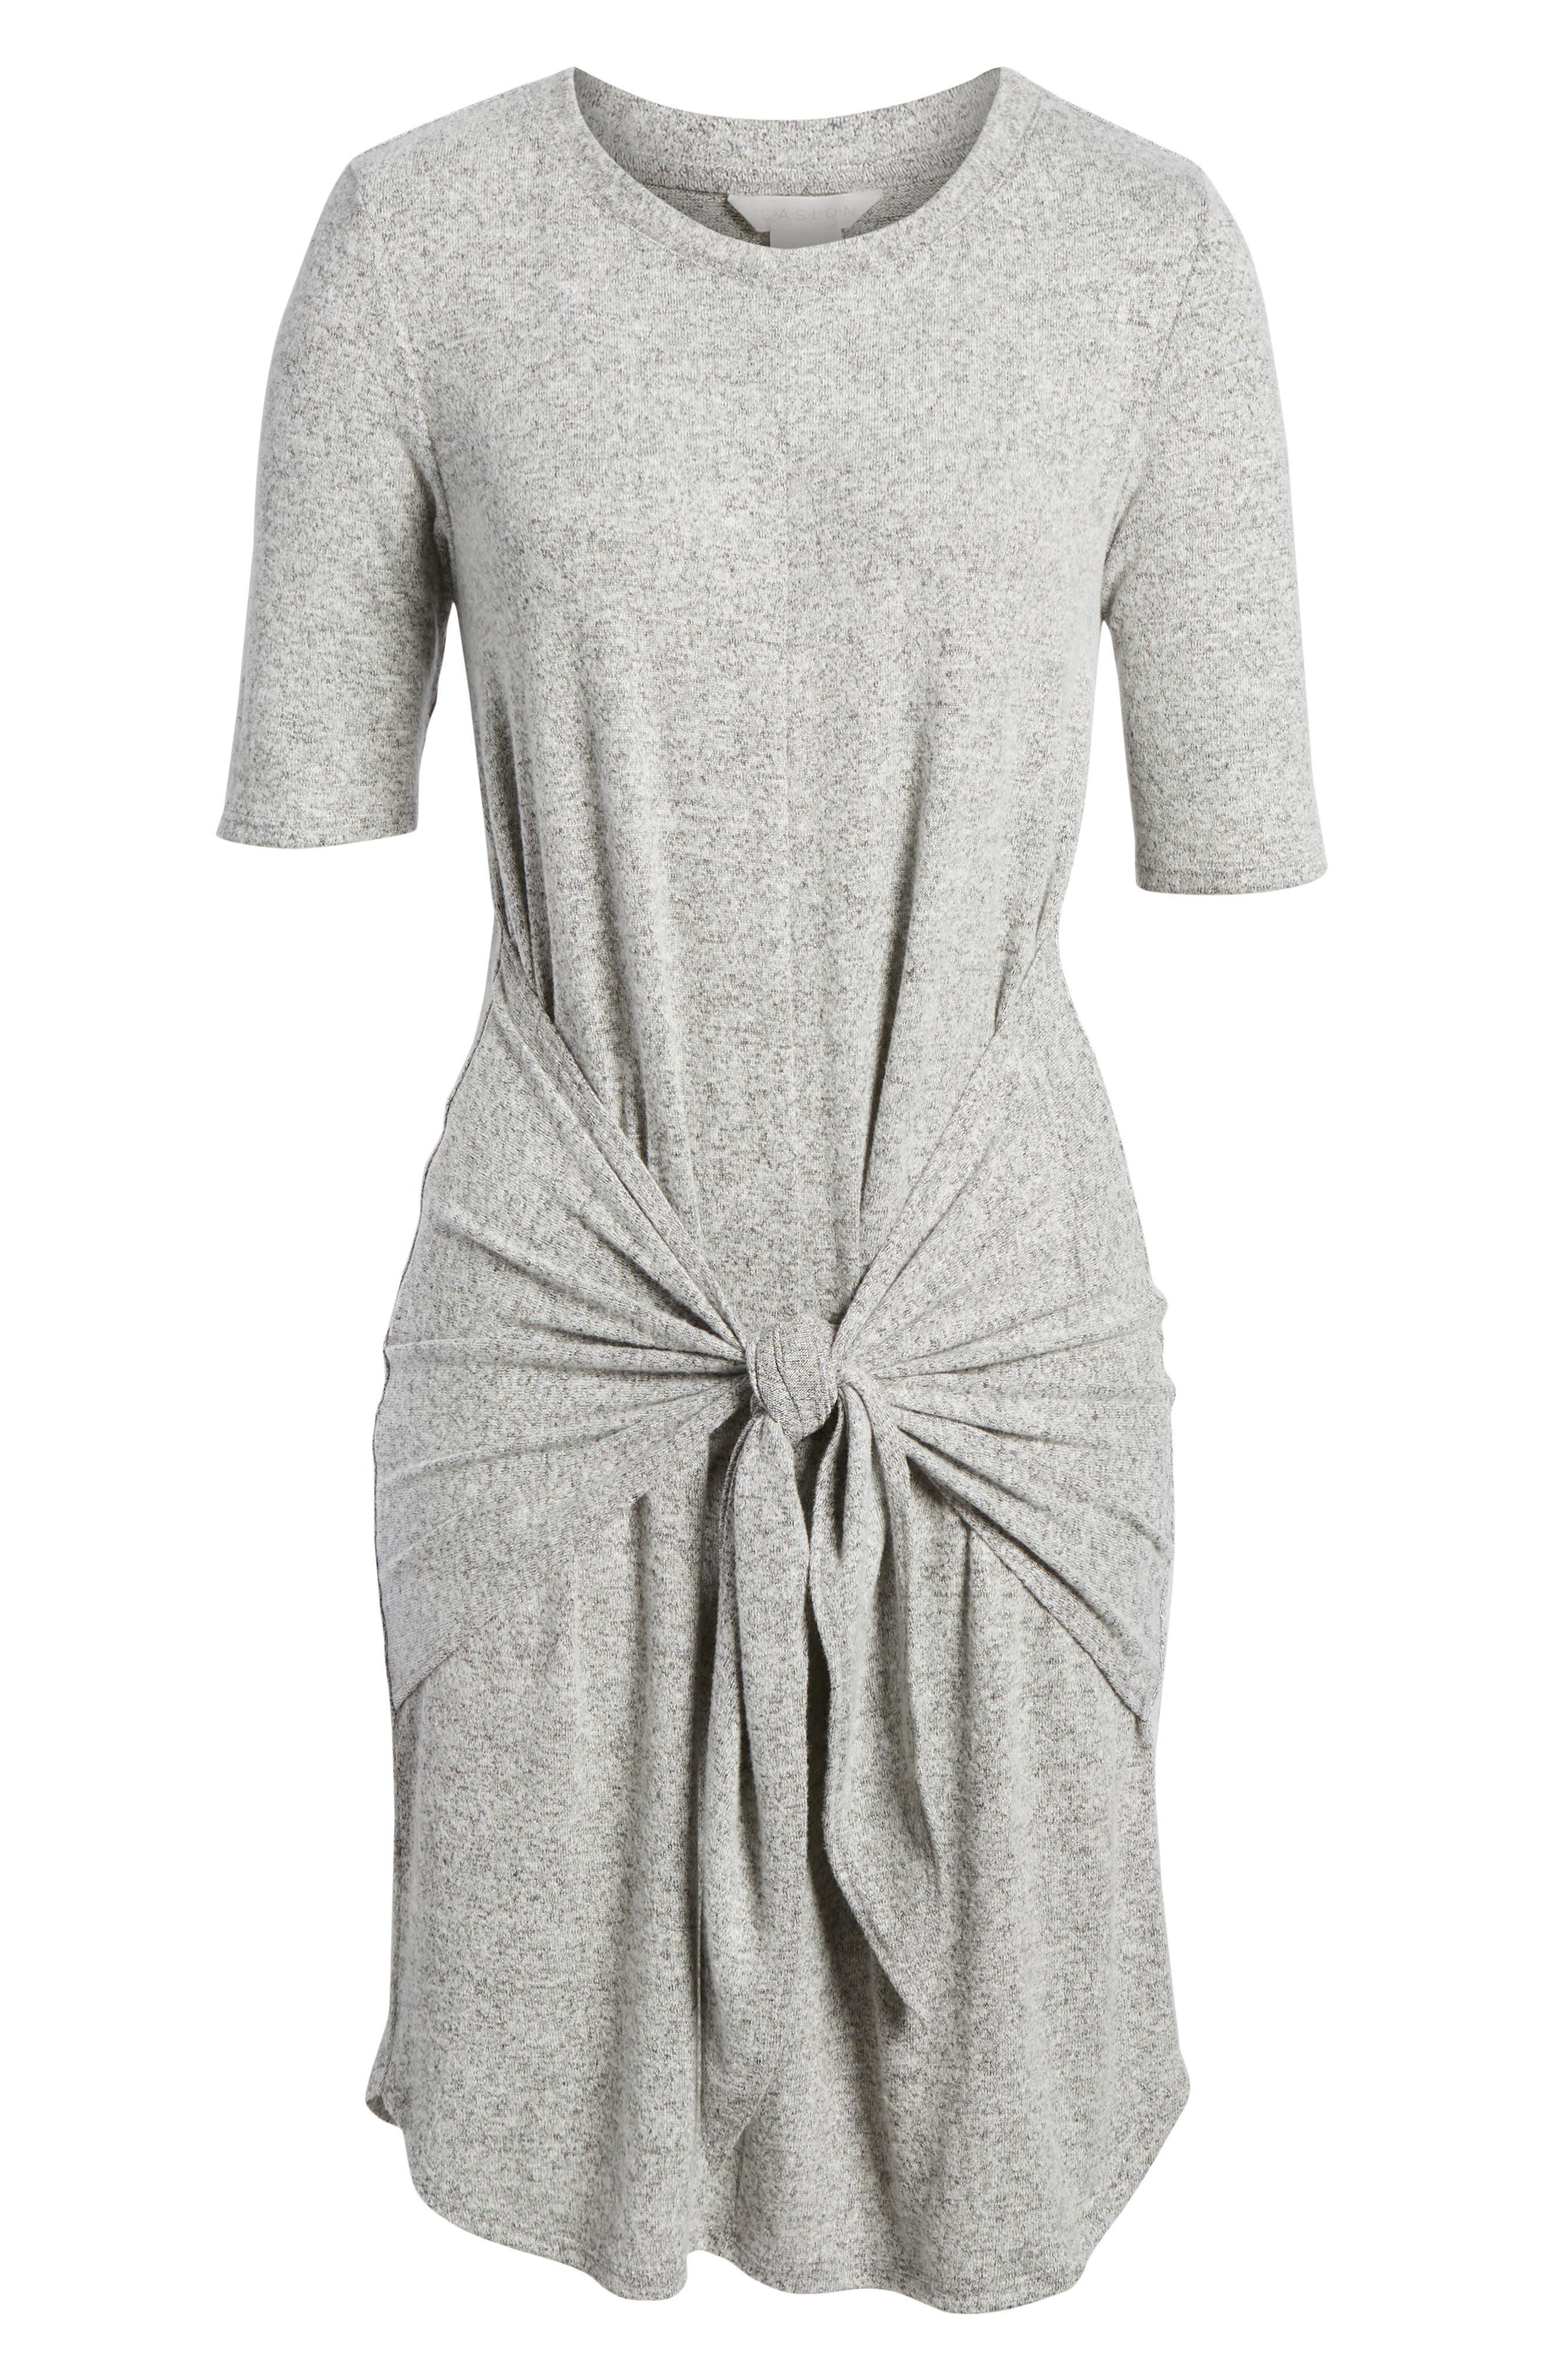 Caslon Off-Duty Tie Front Knit Dress,                             Alternate thumbnail 6, color,                             Grey Heather